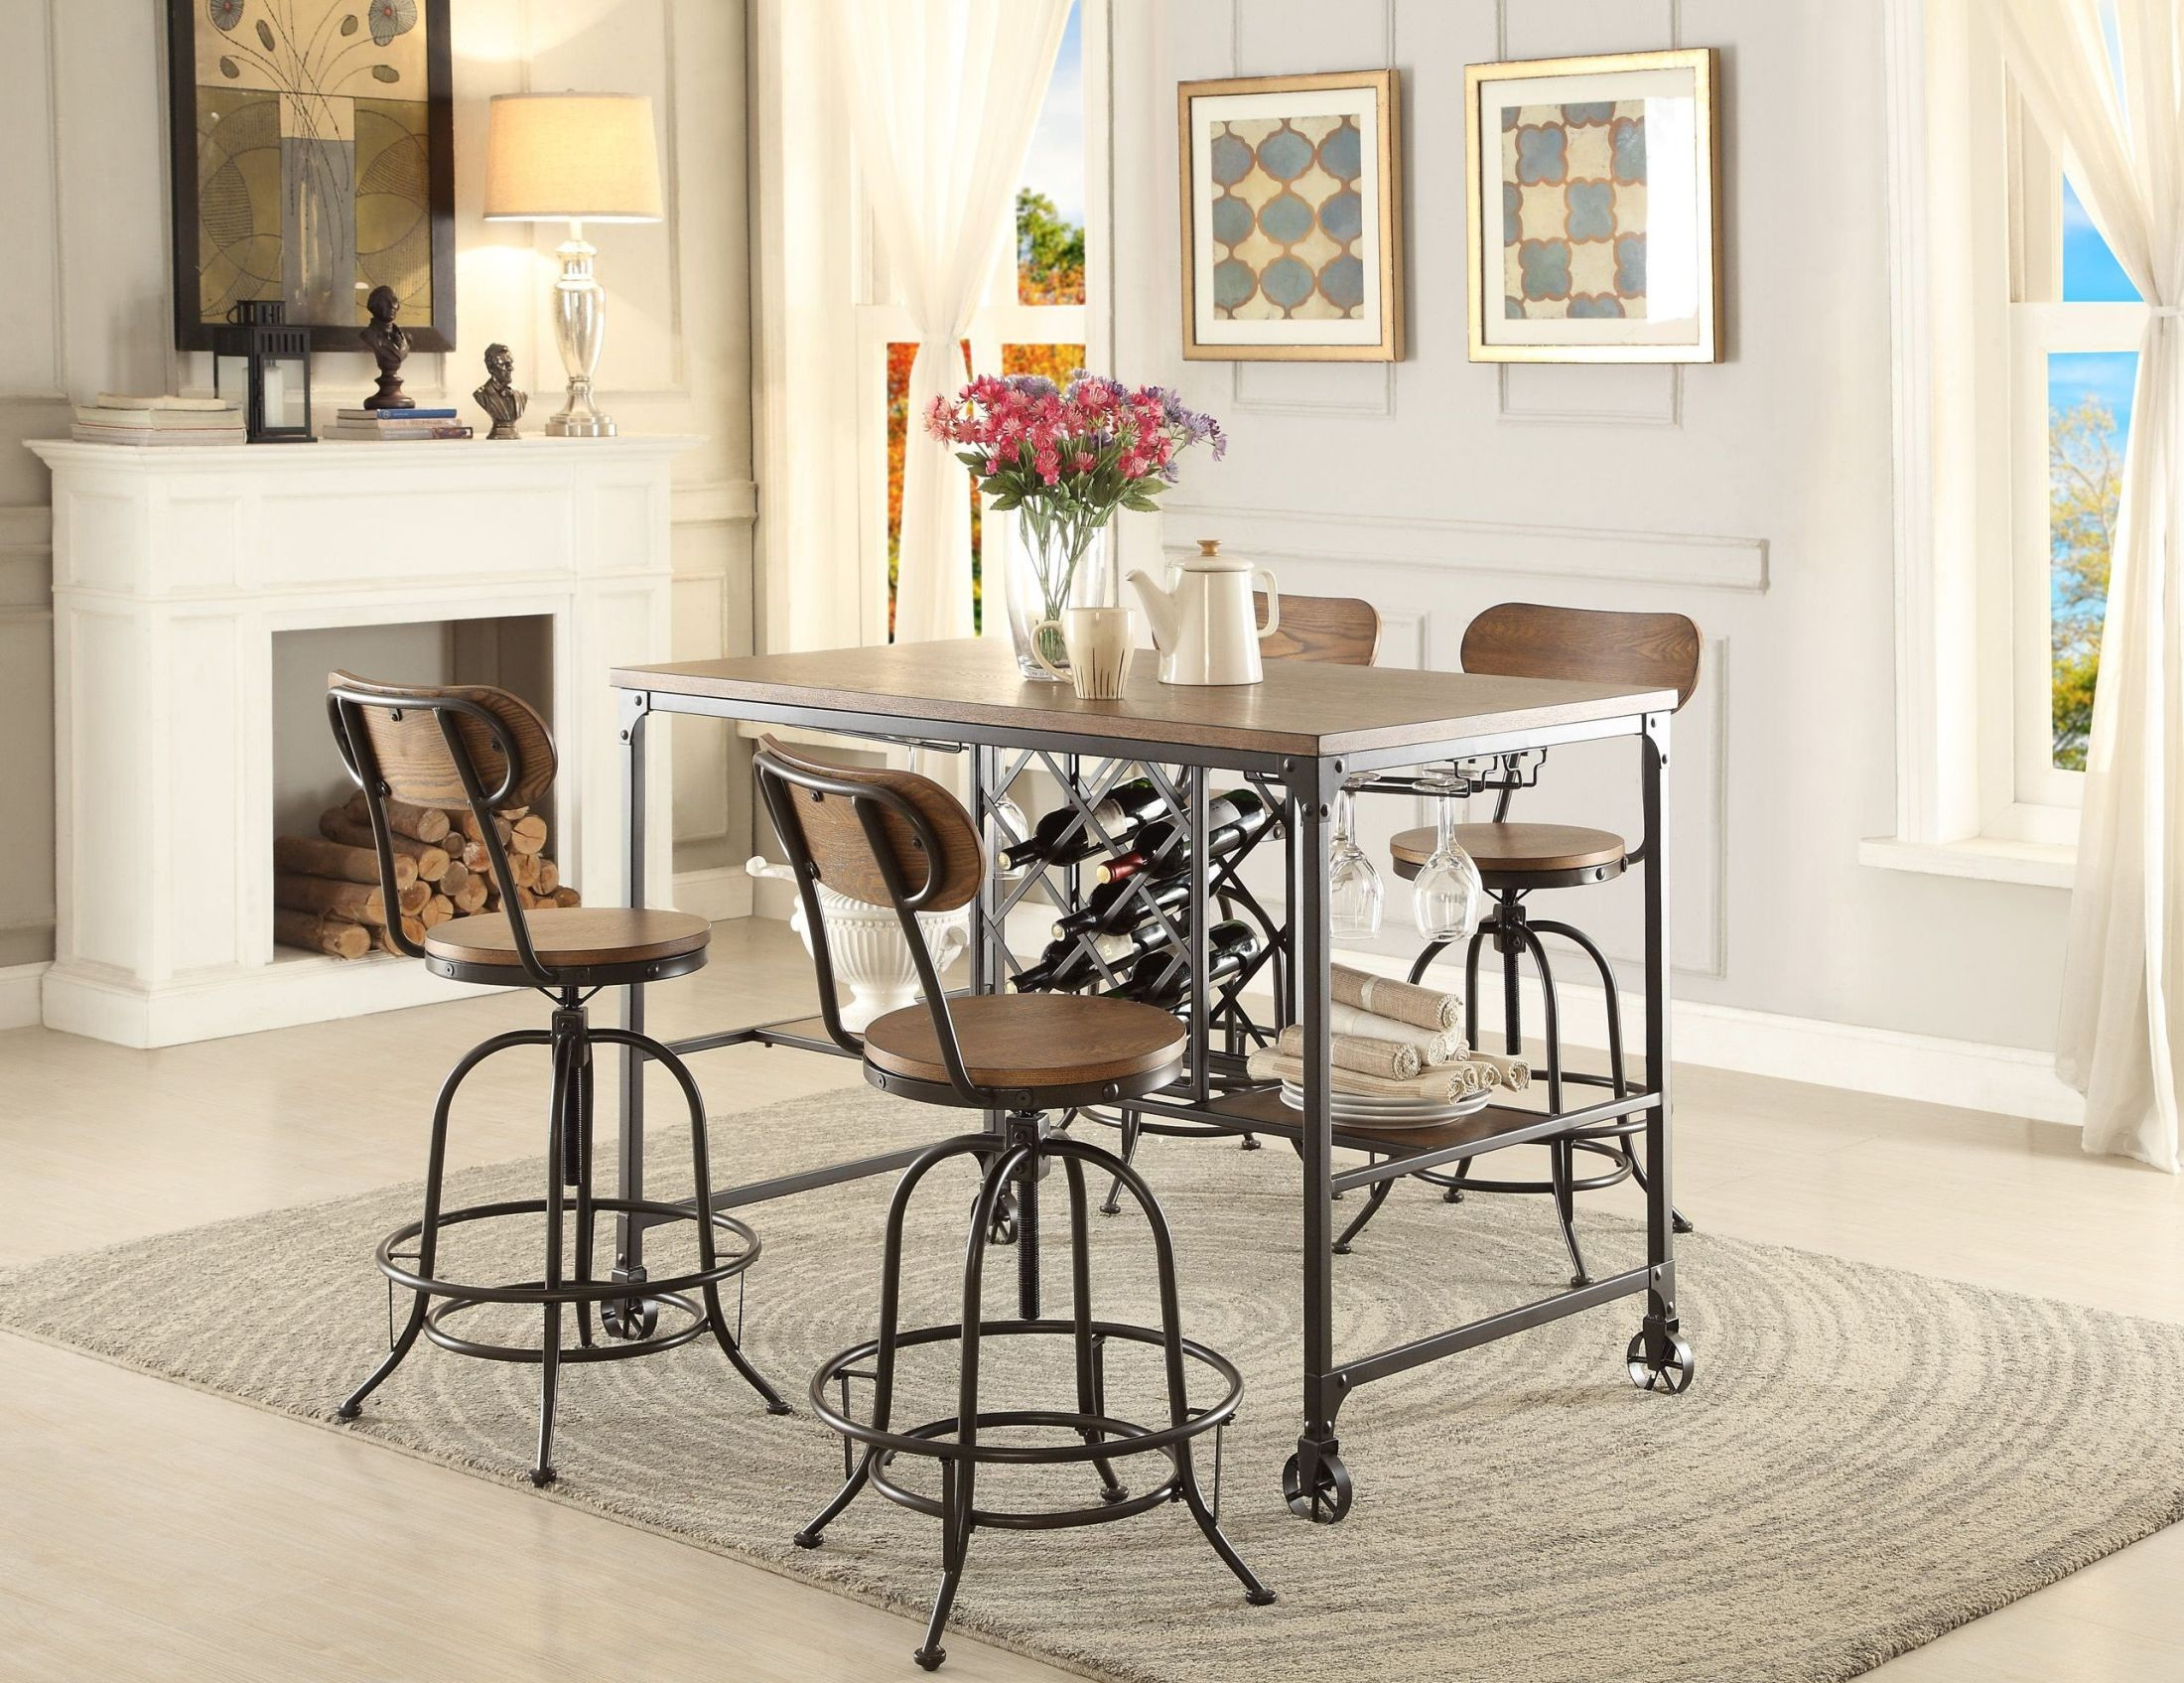 angstrom black counter height dining room set from homelegance coleman furniture. Black Bedroom Furniture Sets. Home Design Ideas